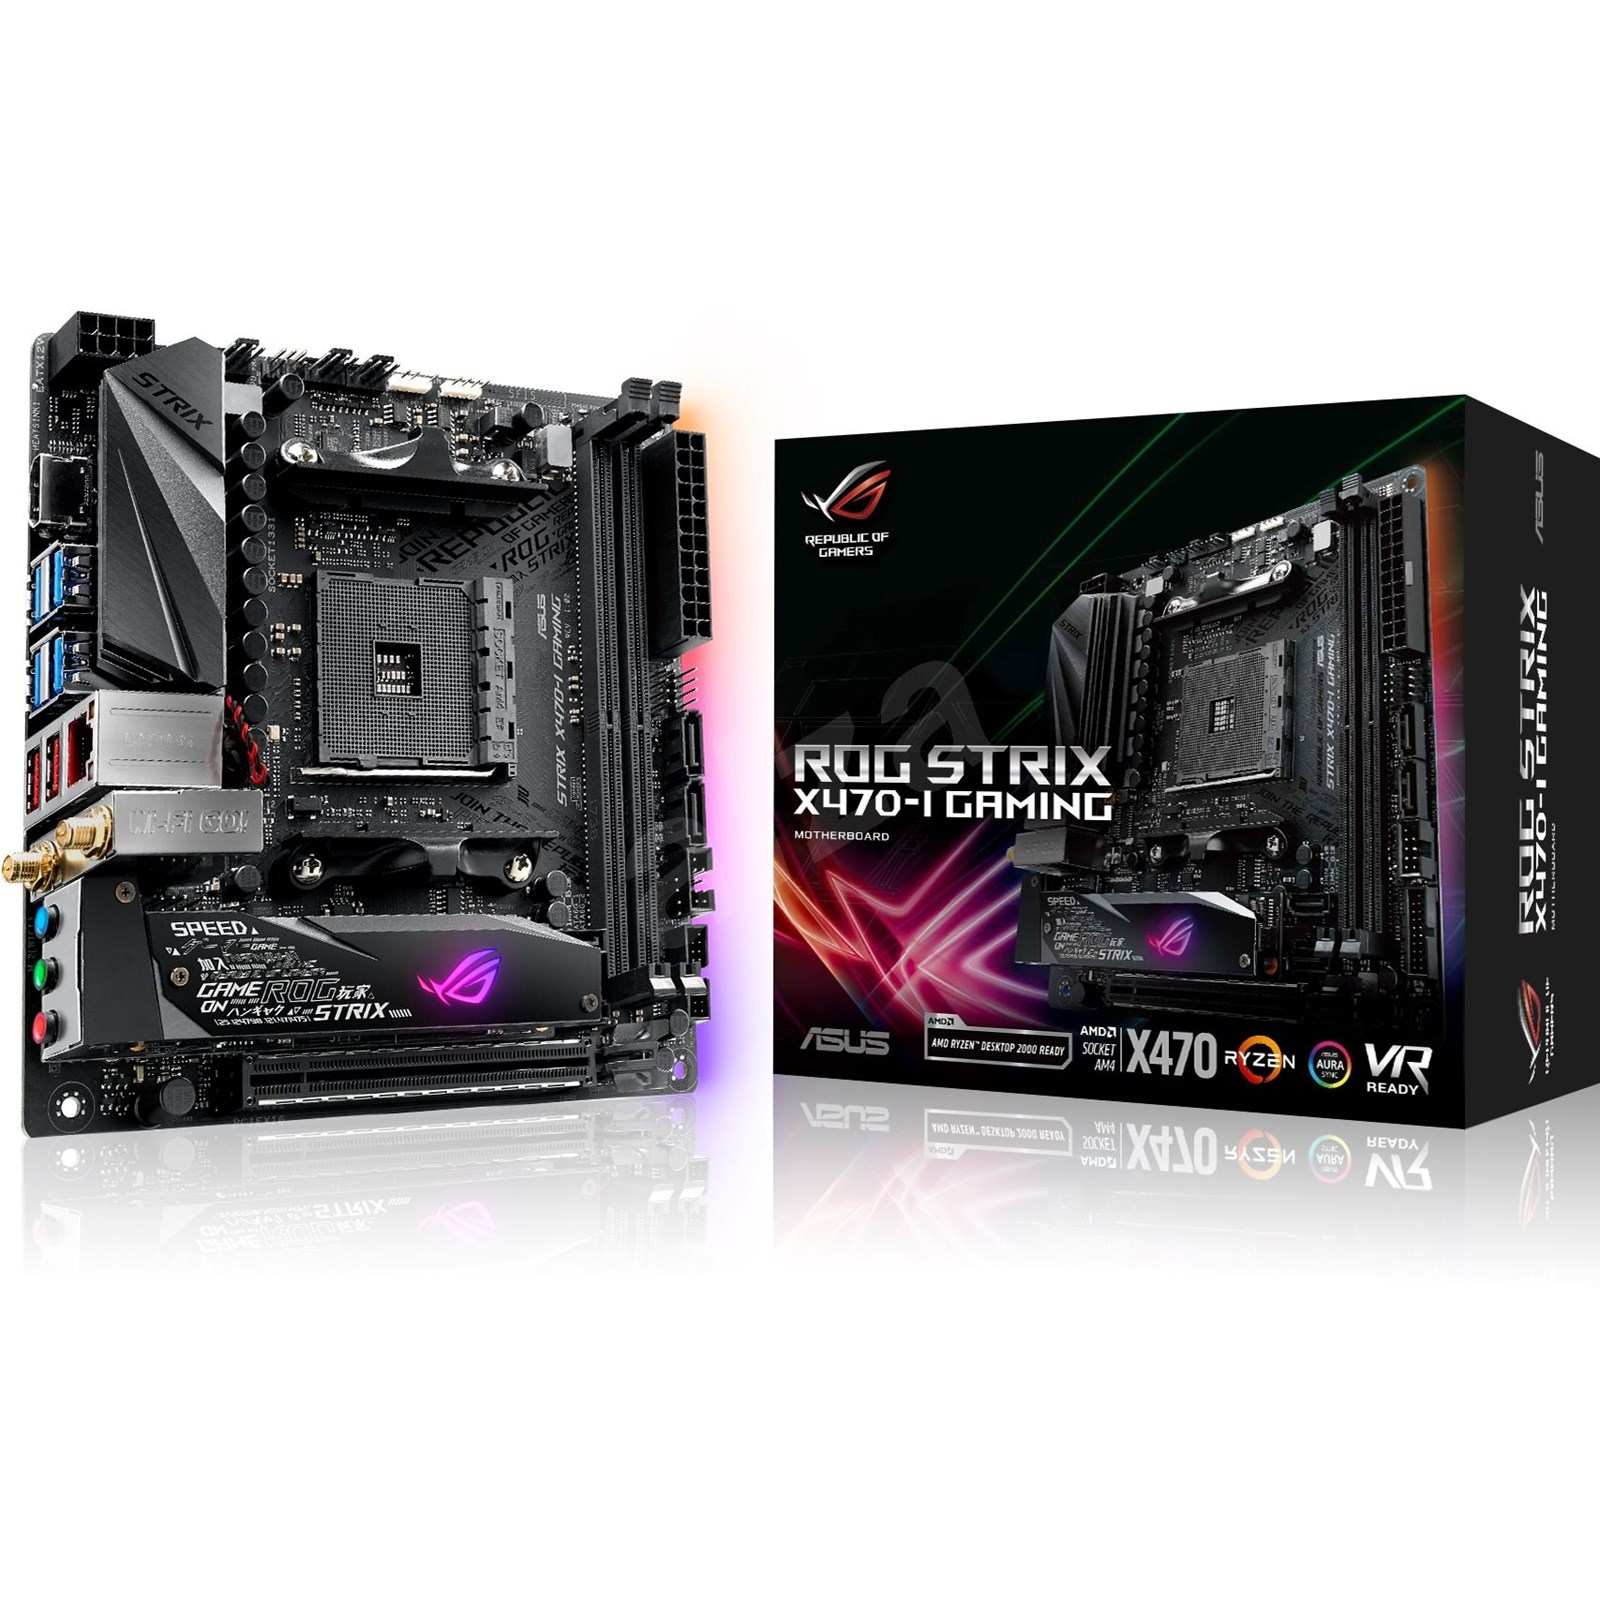 ASUS ROG STRIX X470-I GAMING AMD Motherboard - 90MB0XE0